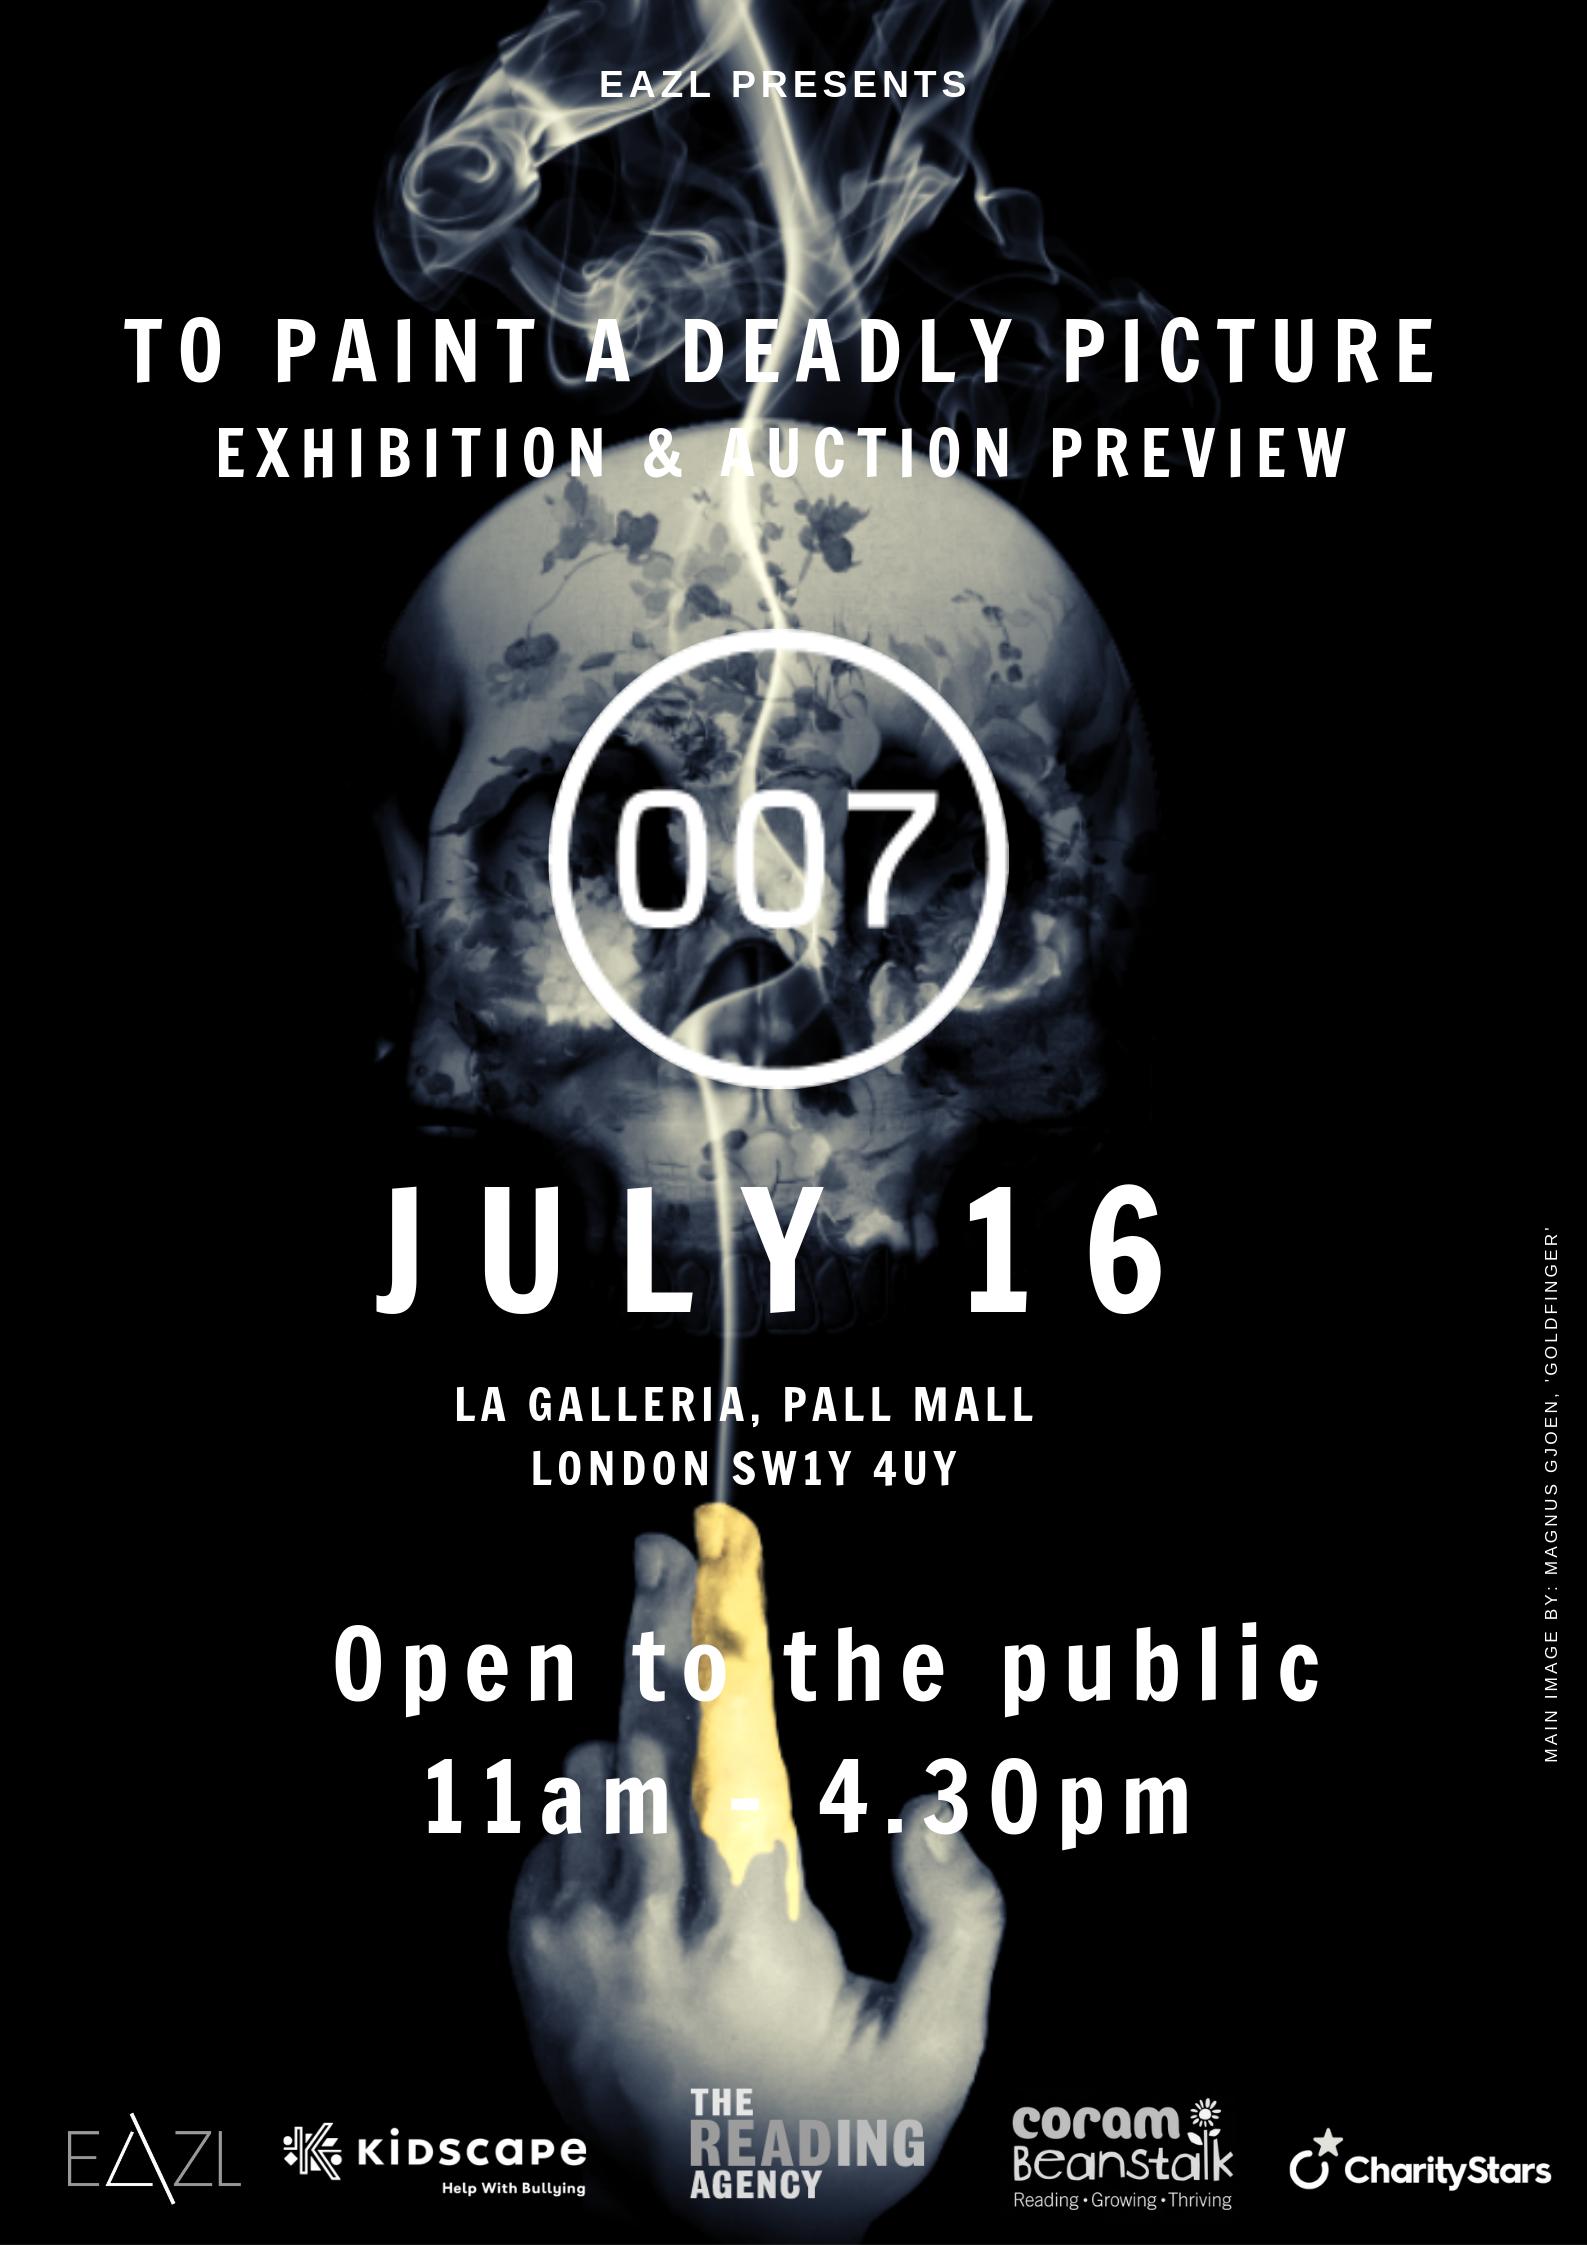 EAZL invitation